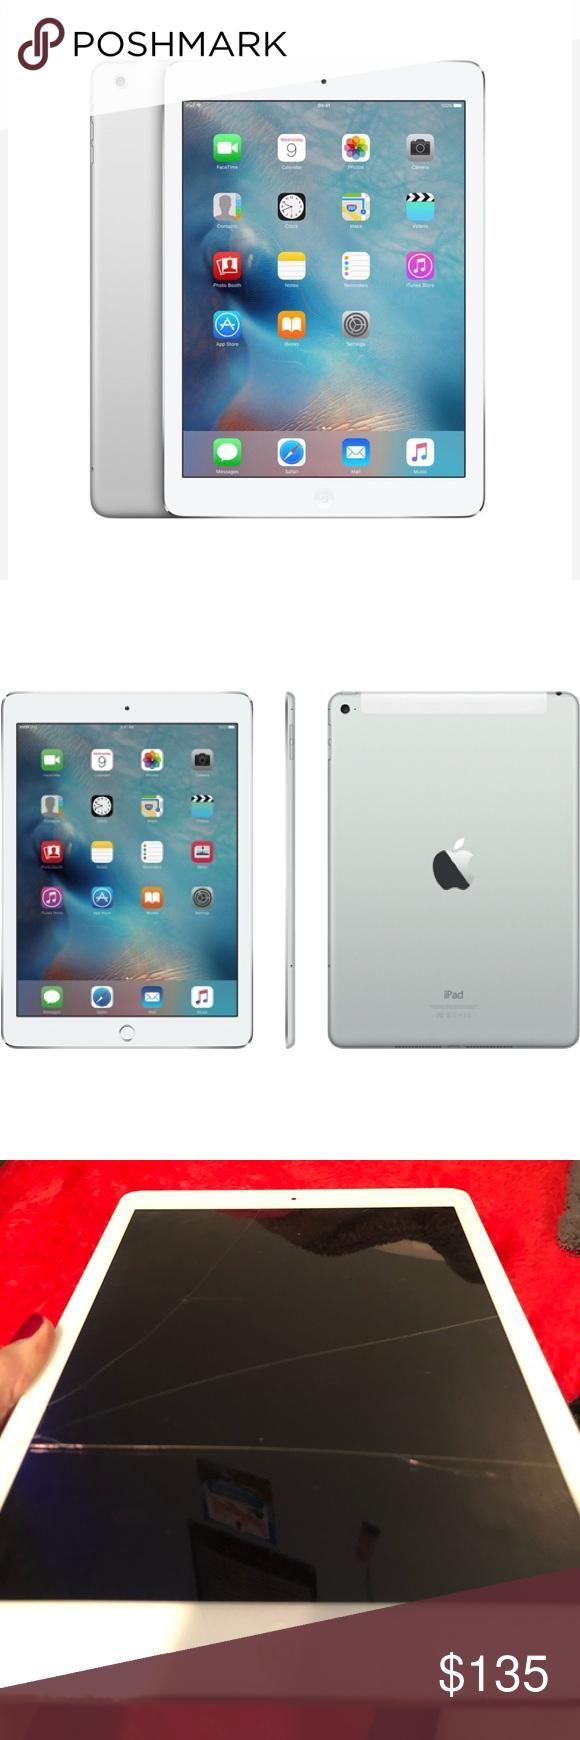 Apple Ipad Air 1 Silver White Apple Ipad Ipad Air Apple Ipad Air